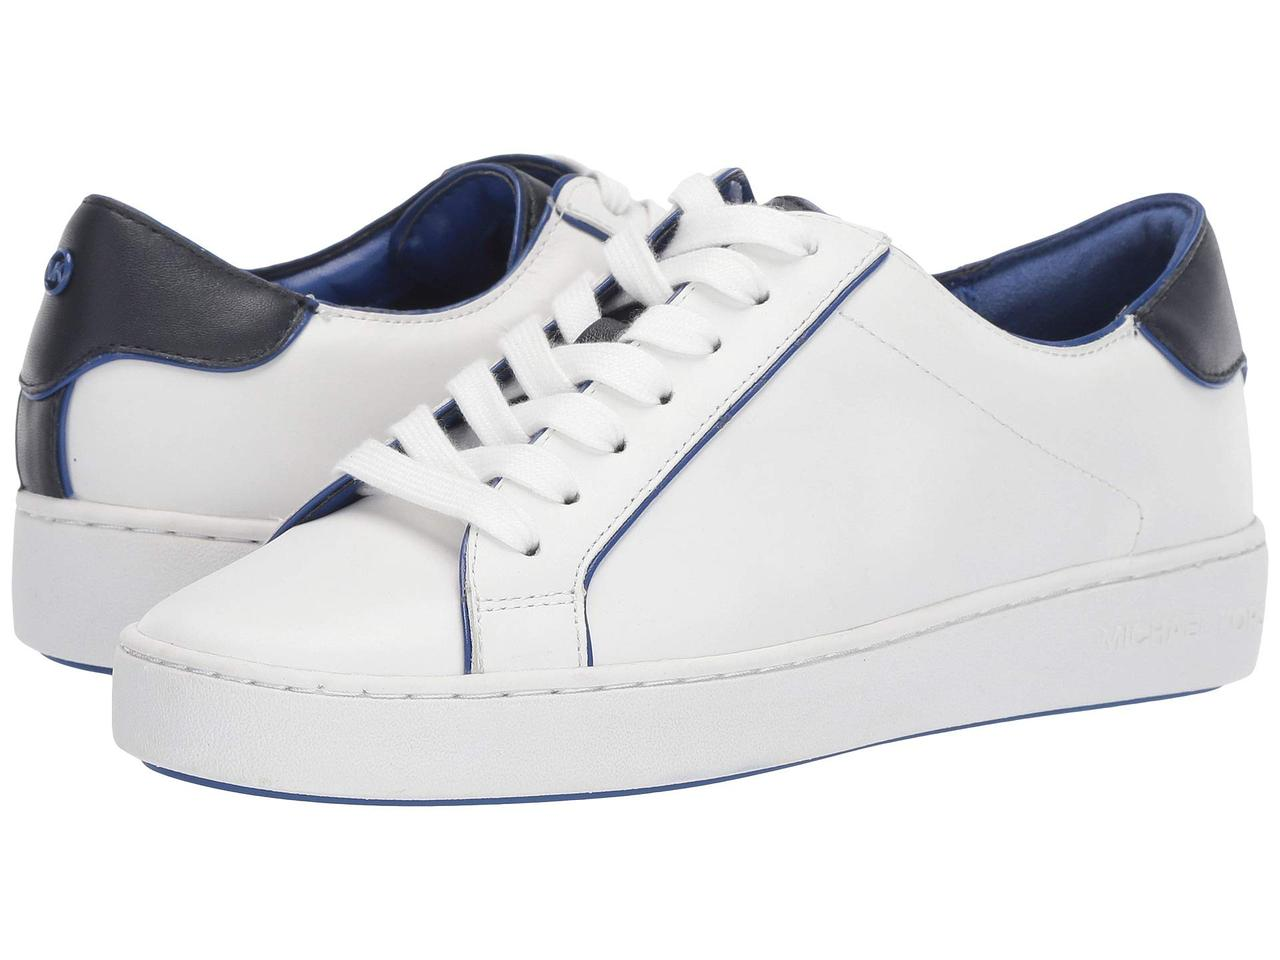 8b088bc95270 Кроссовки MICHAEL Michael Kors Harper Lace-Up White - Оригинал - FAIR -  оригинальная одежда